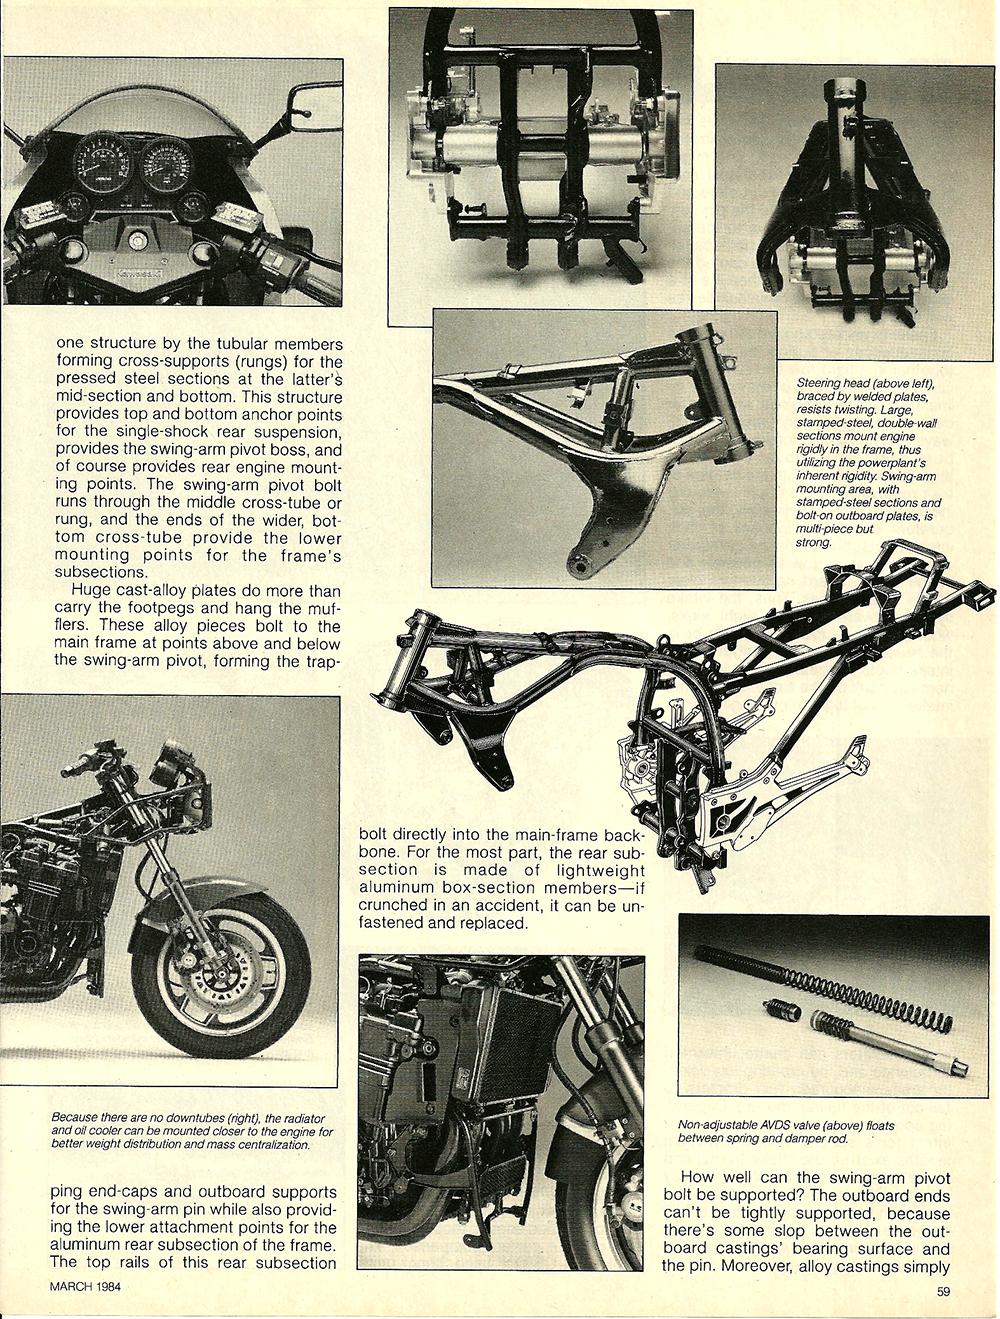 1984 Kawasaki GPz 900R Ninja road test 05.jpg